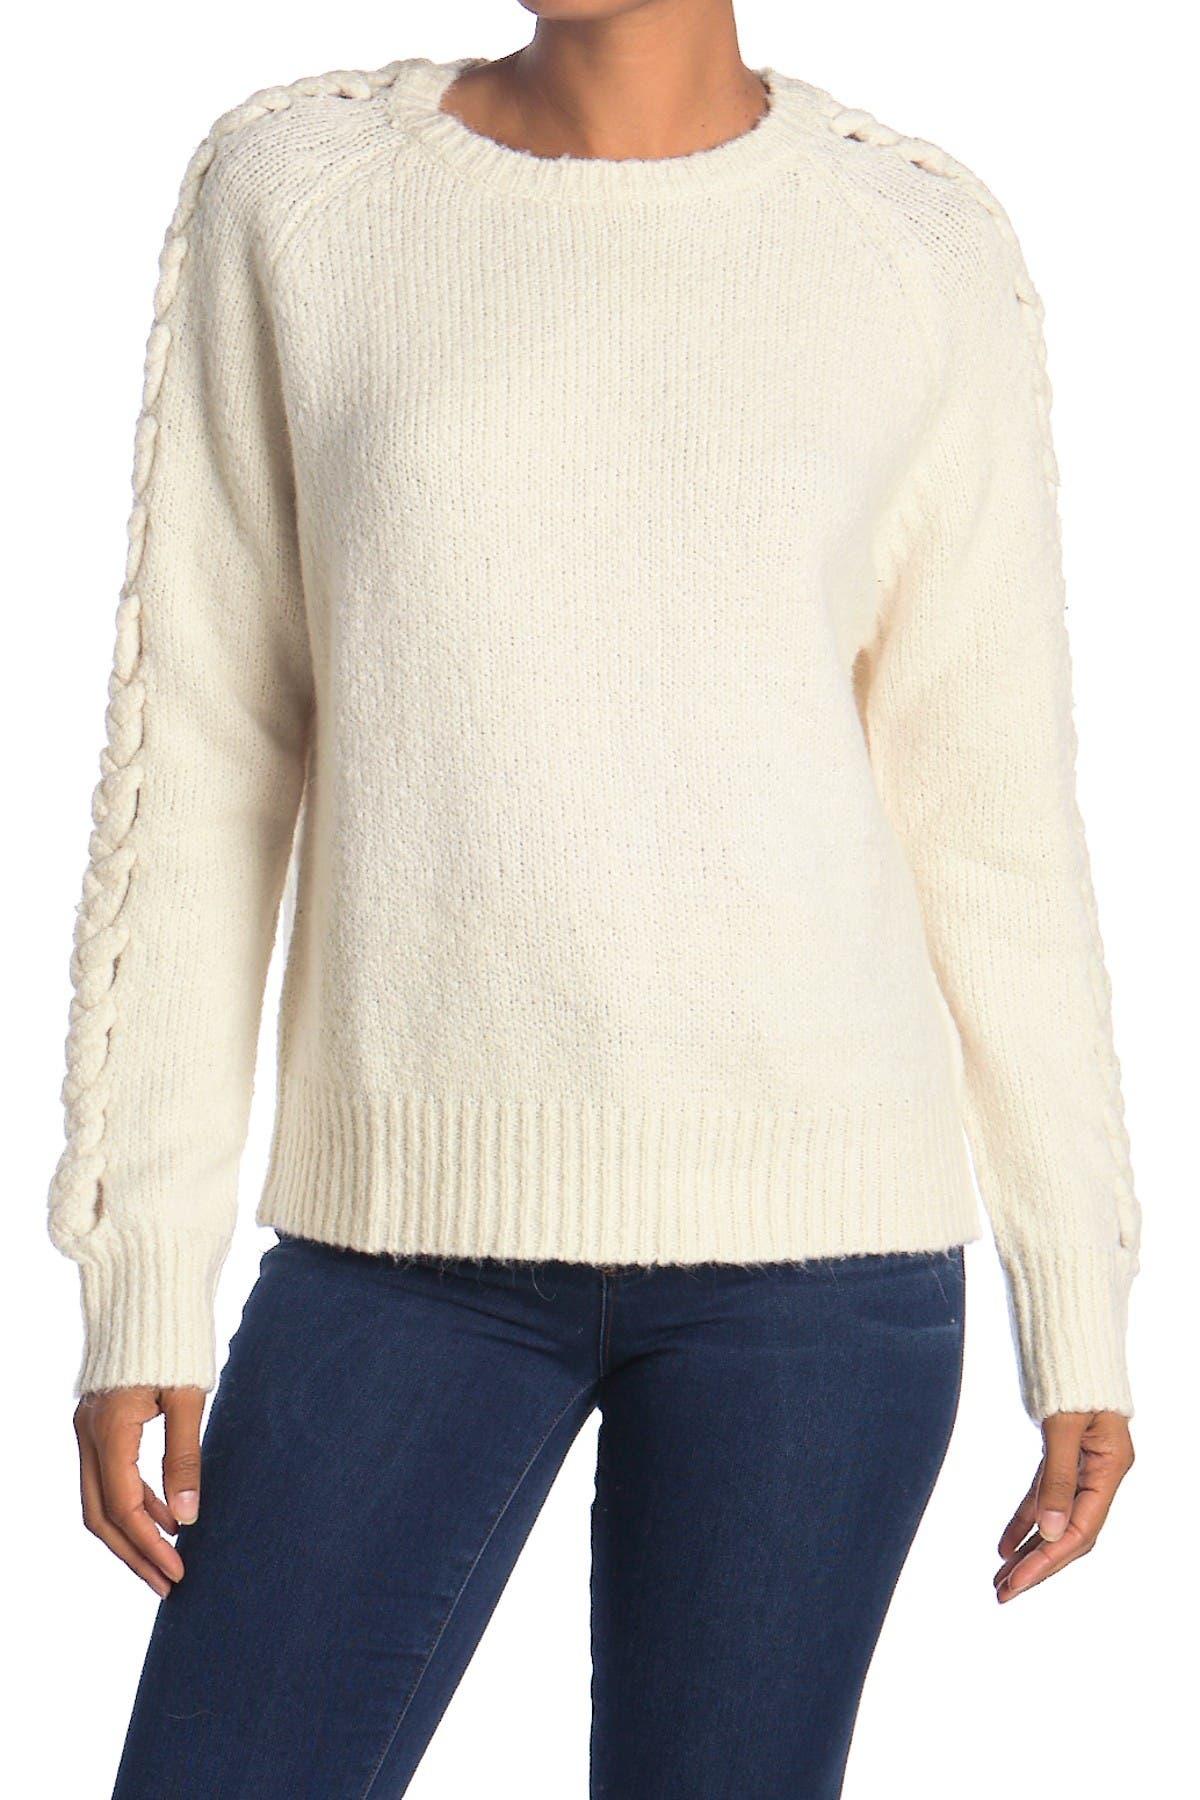 Image of Line Madga Knit Sweater